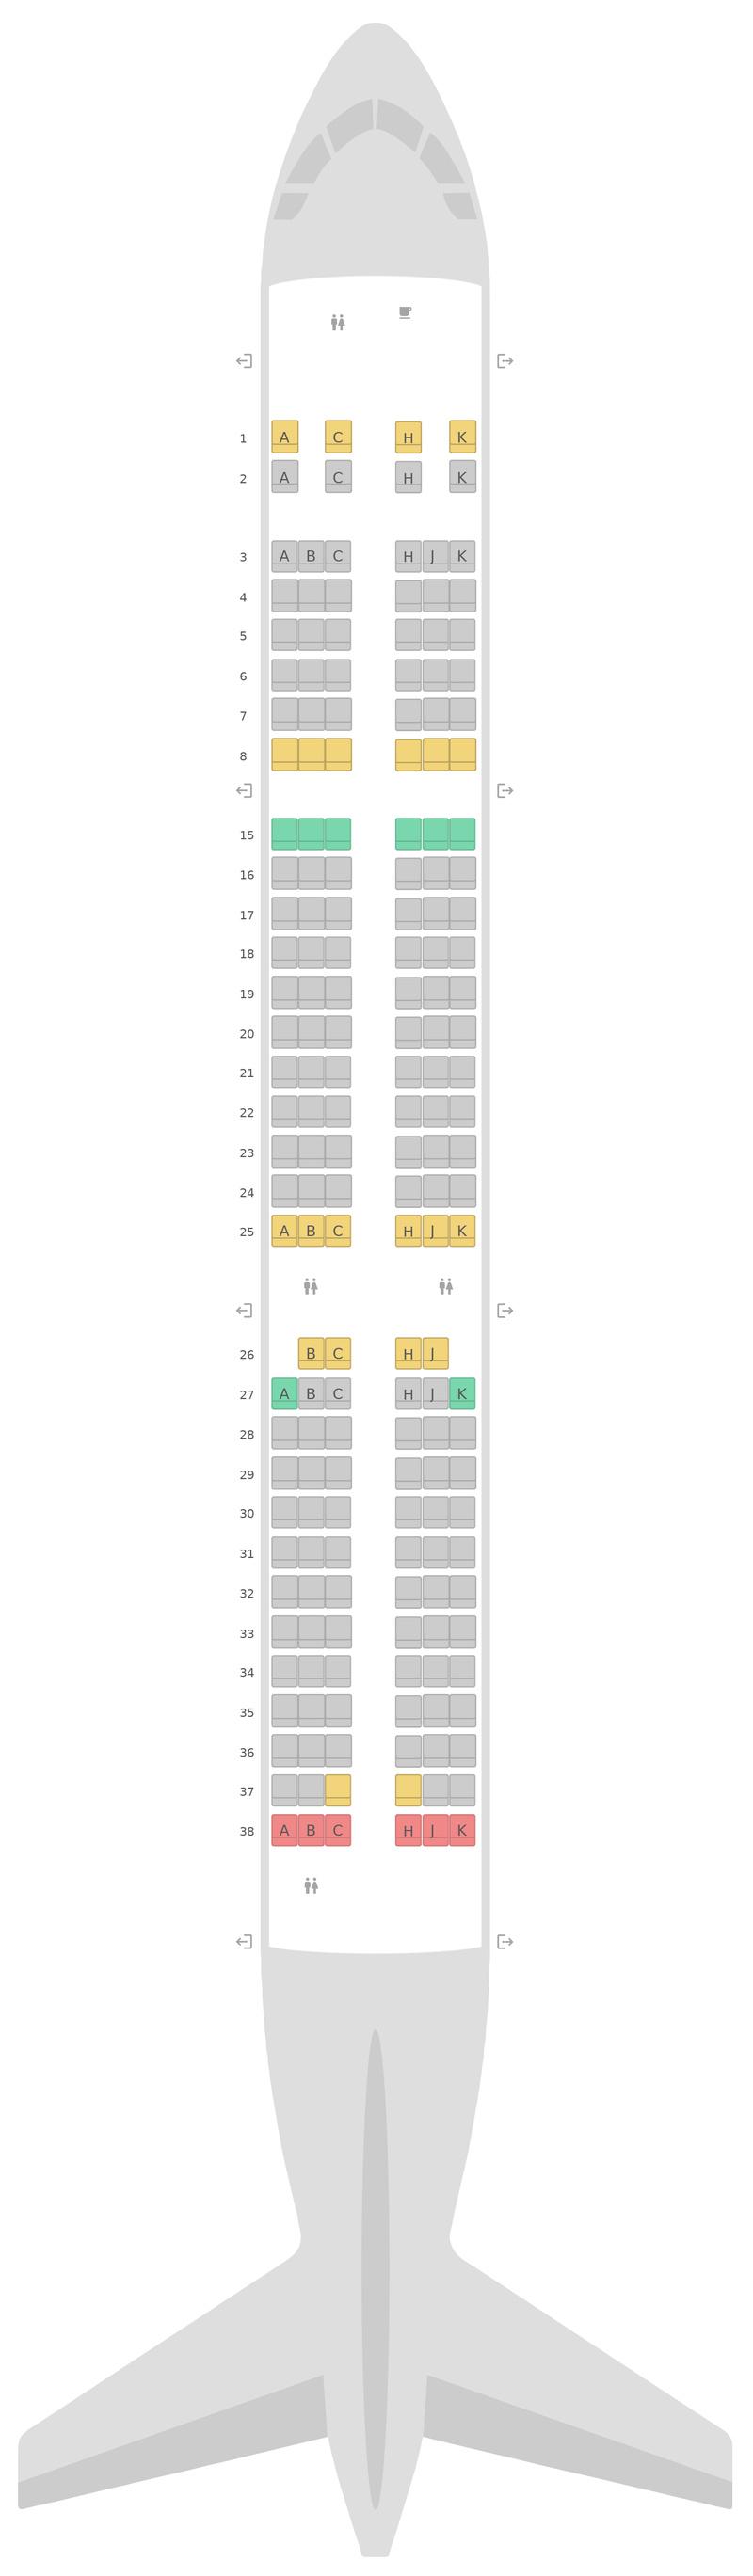 Seat Map Air Transat Airbus A321 2 Class